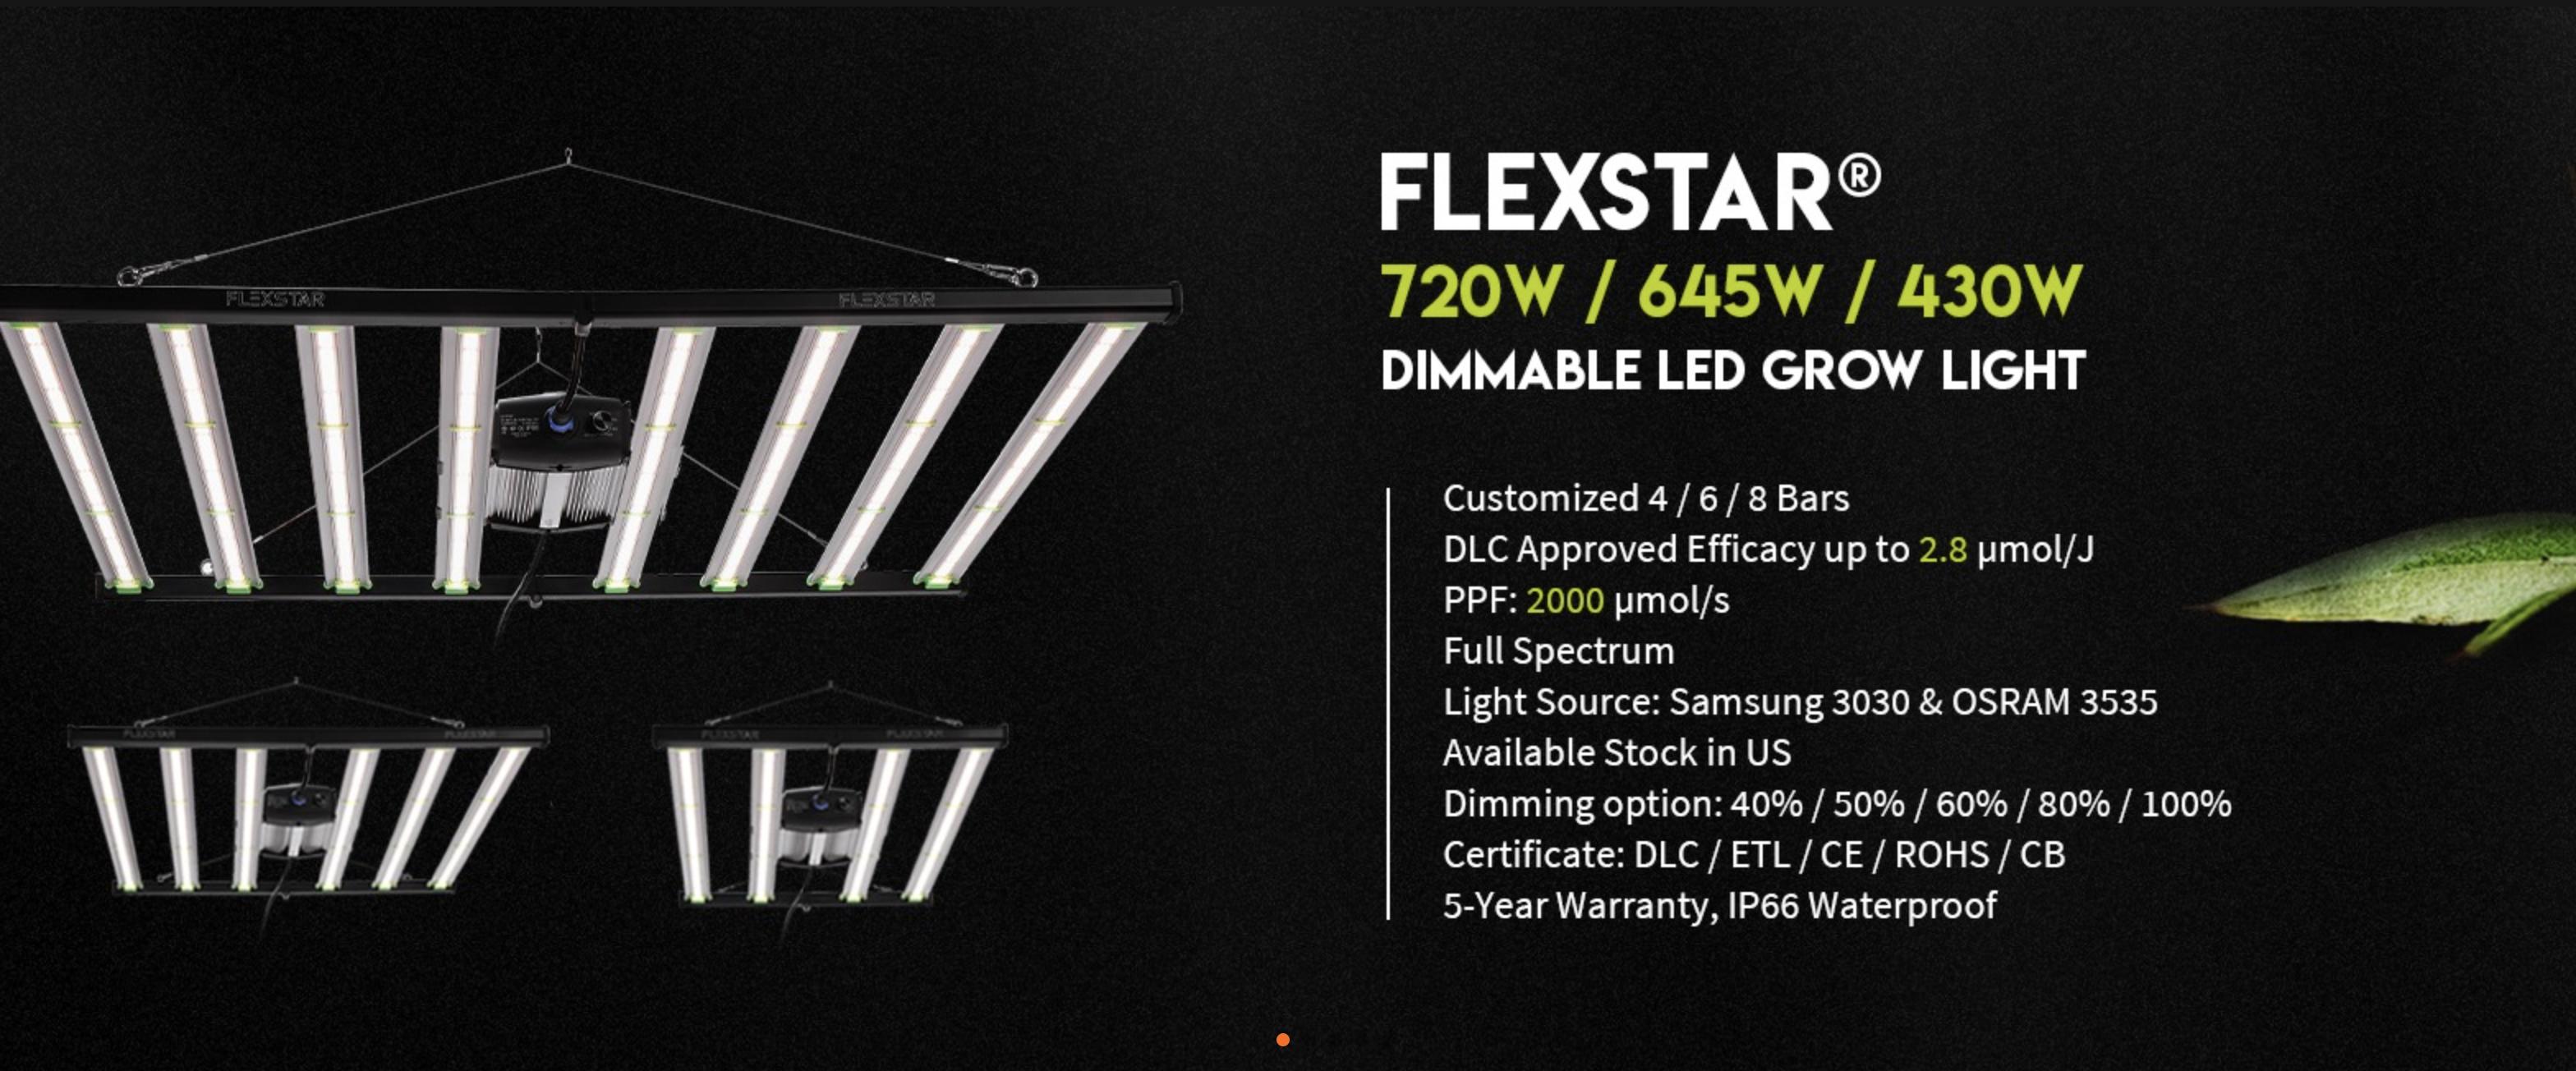 Manufacturer—Flexstar 645W Dimmable LED Grow Light